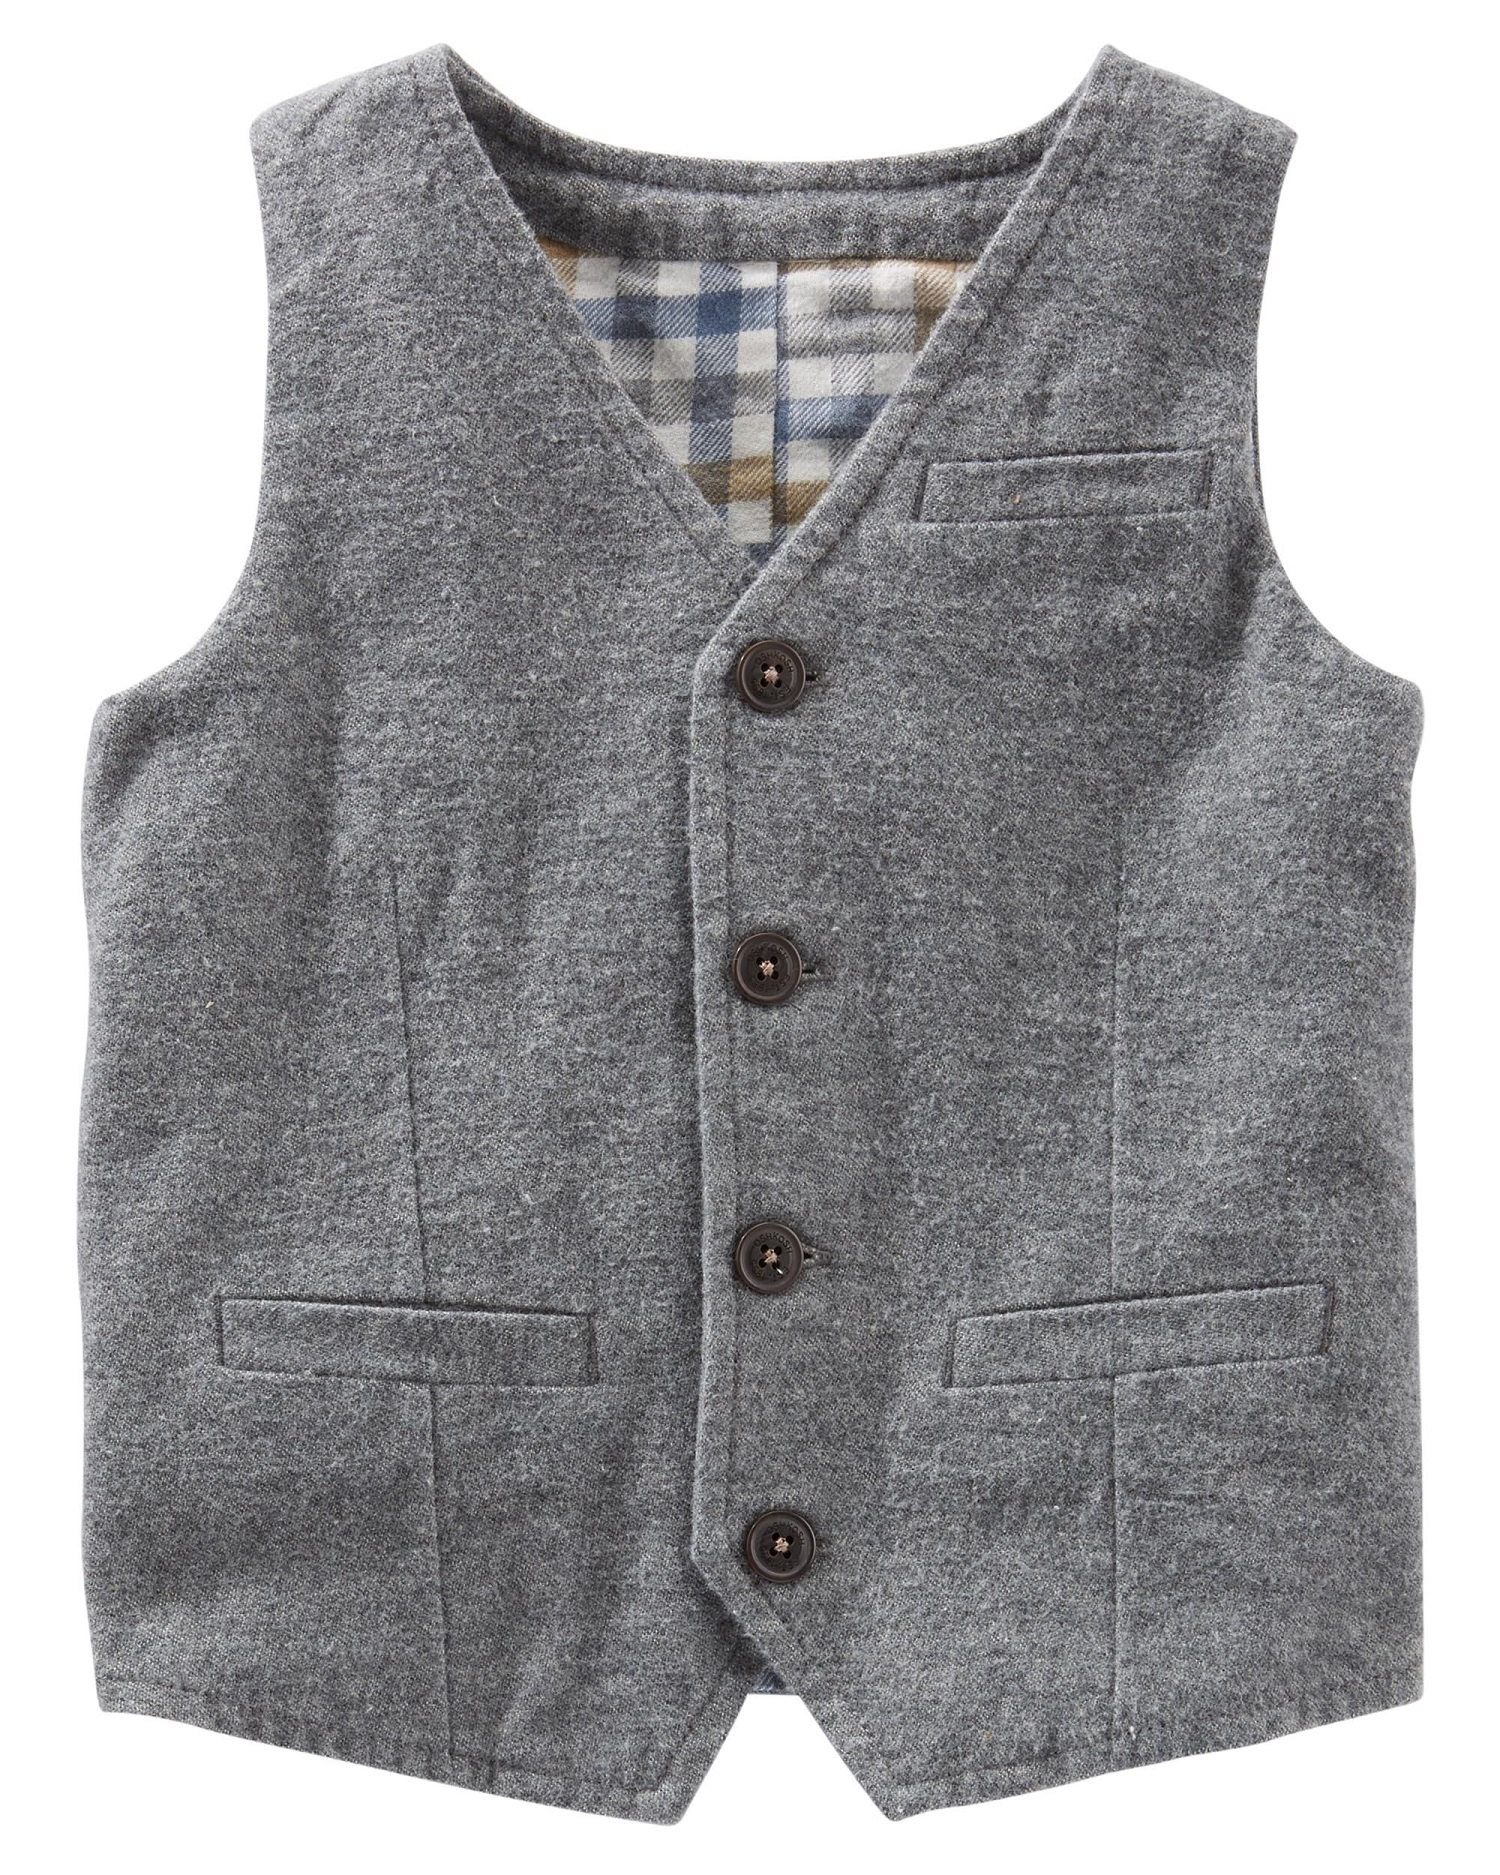 OshKosh B'gosh Little Boys' Suit Vest, Gray, 4-Toddler